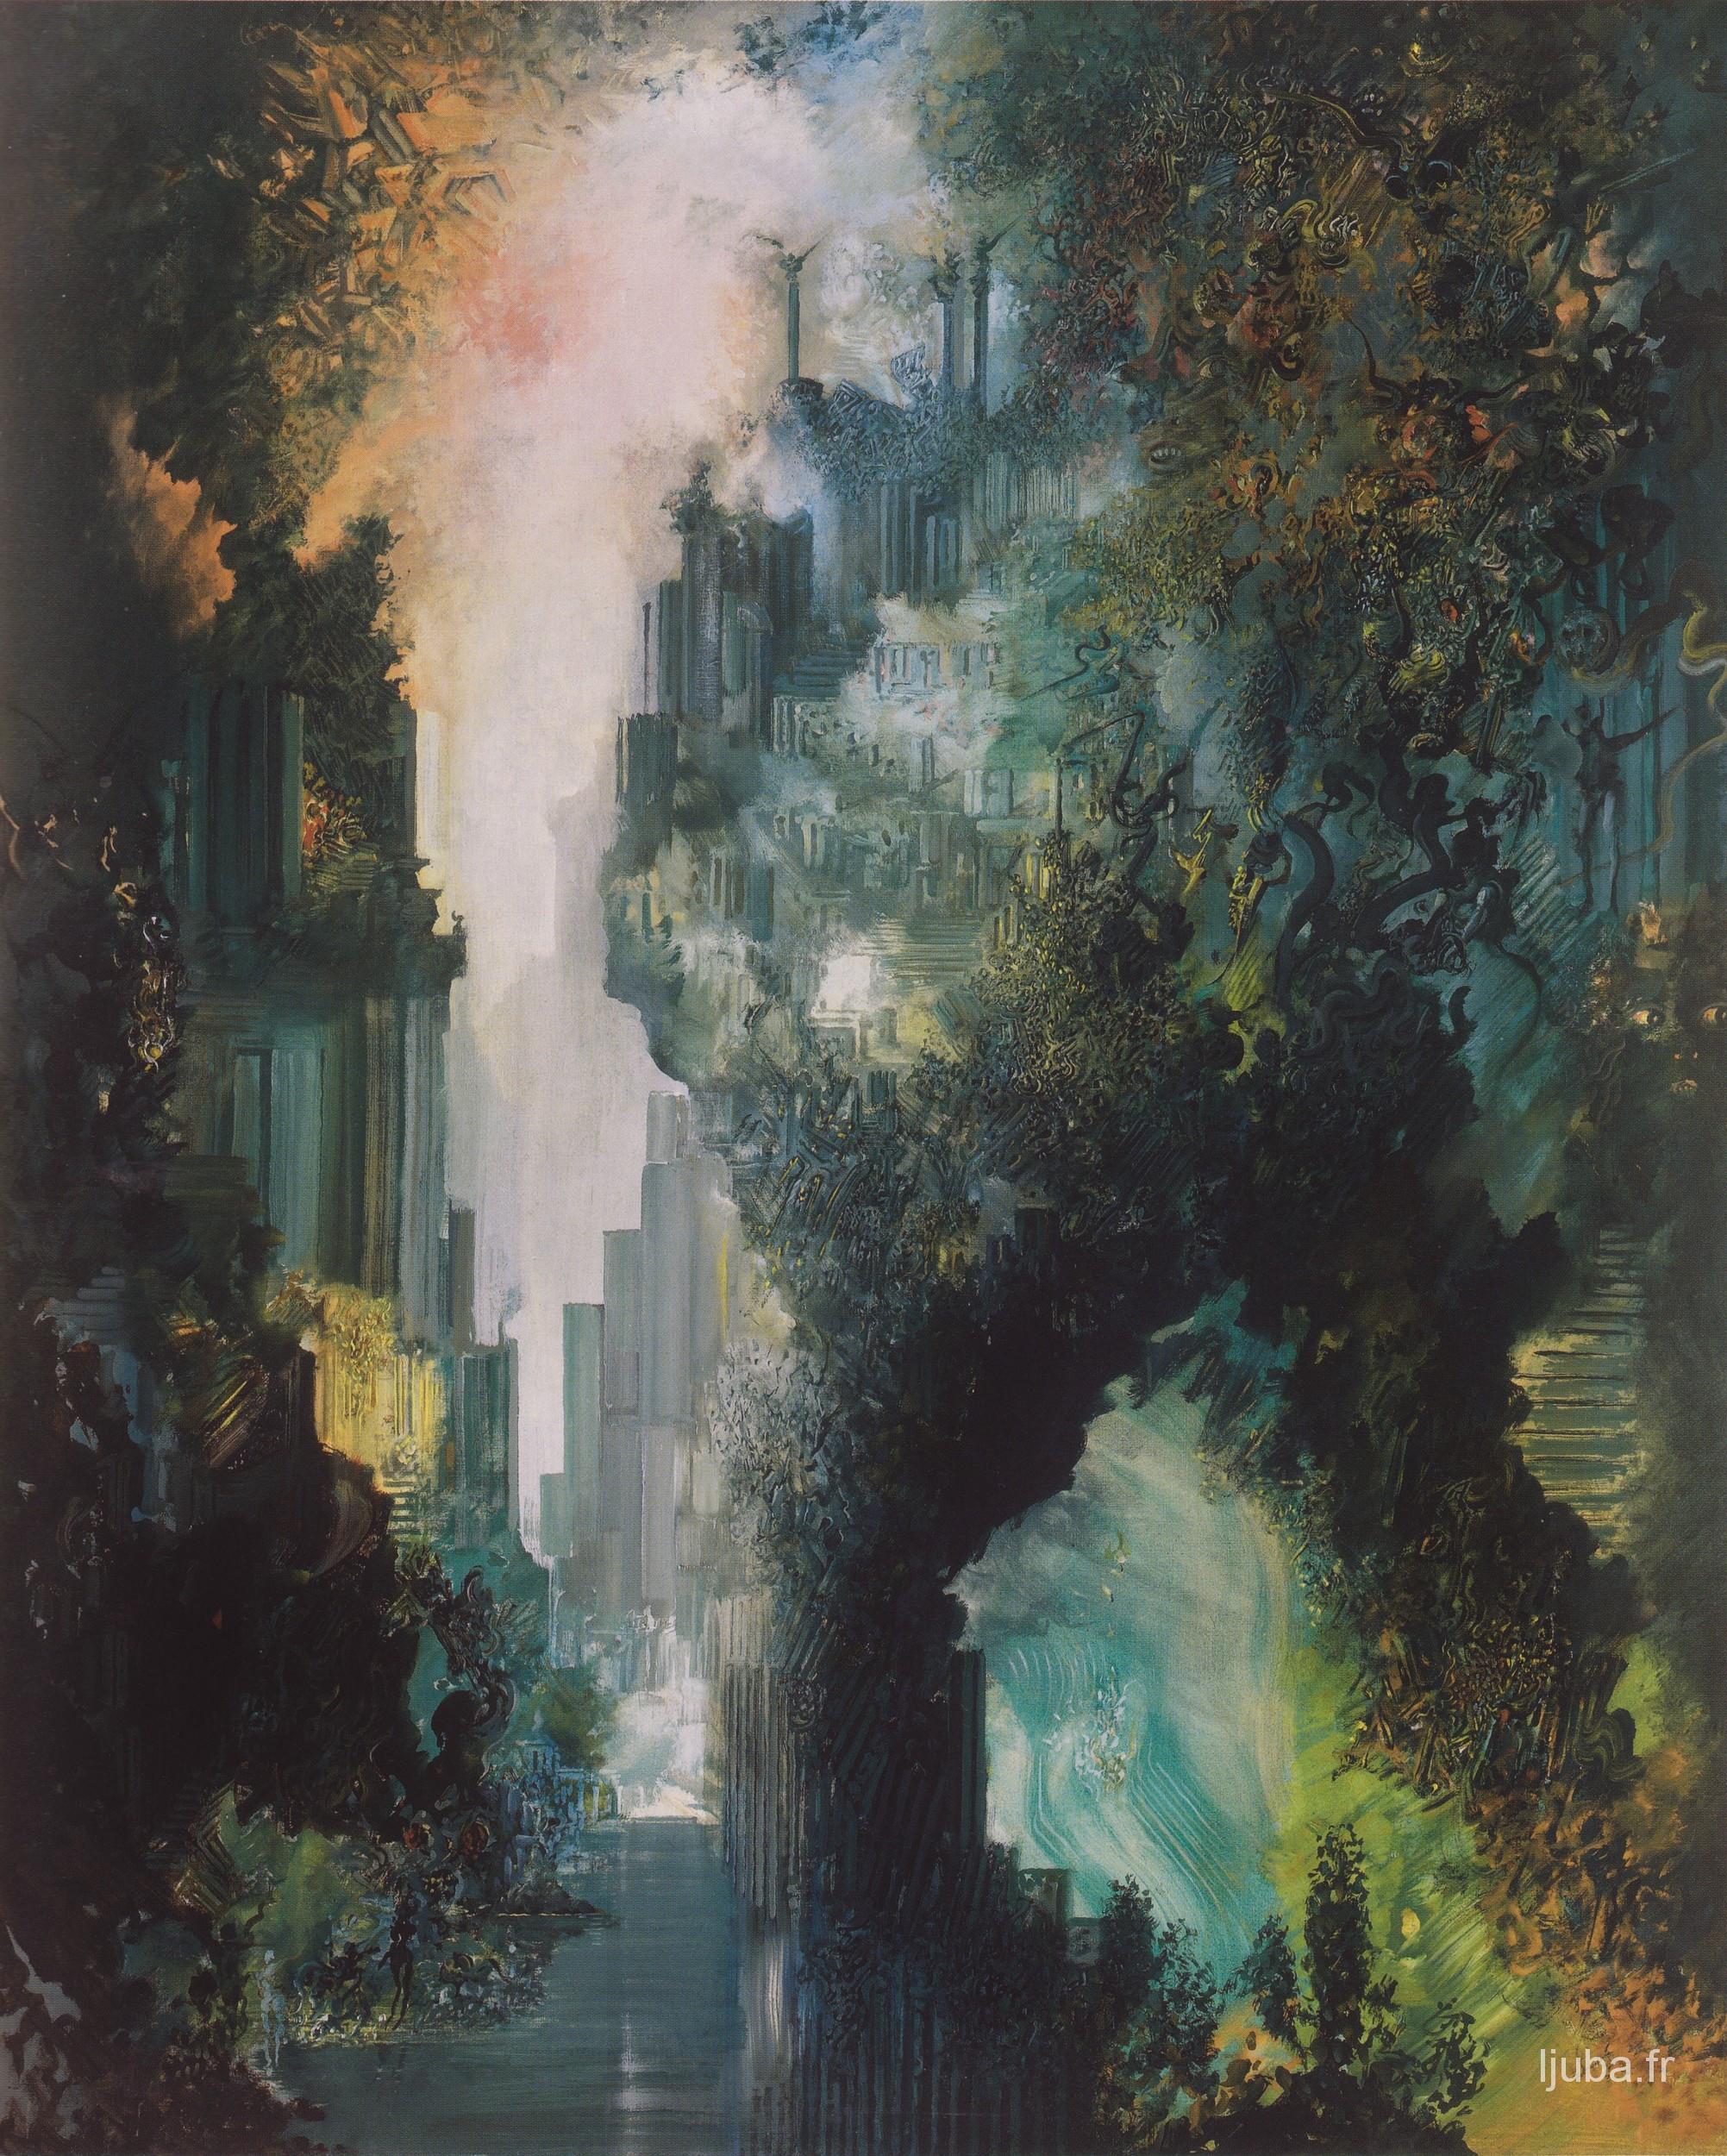 Ljuba Popovic - 1991, Les élixirs de vie